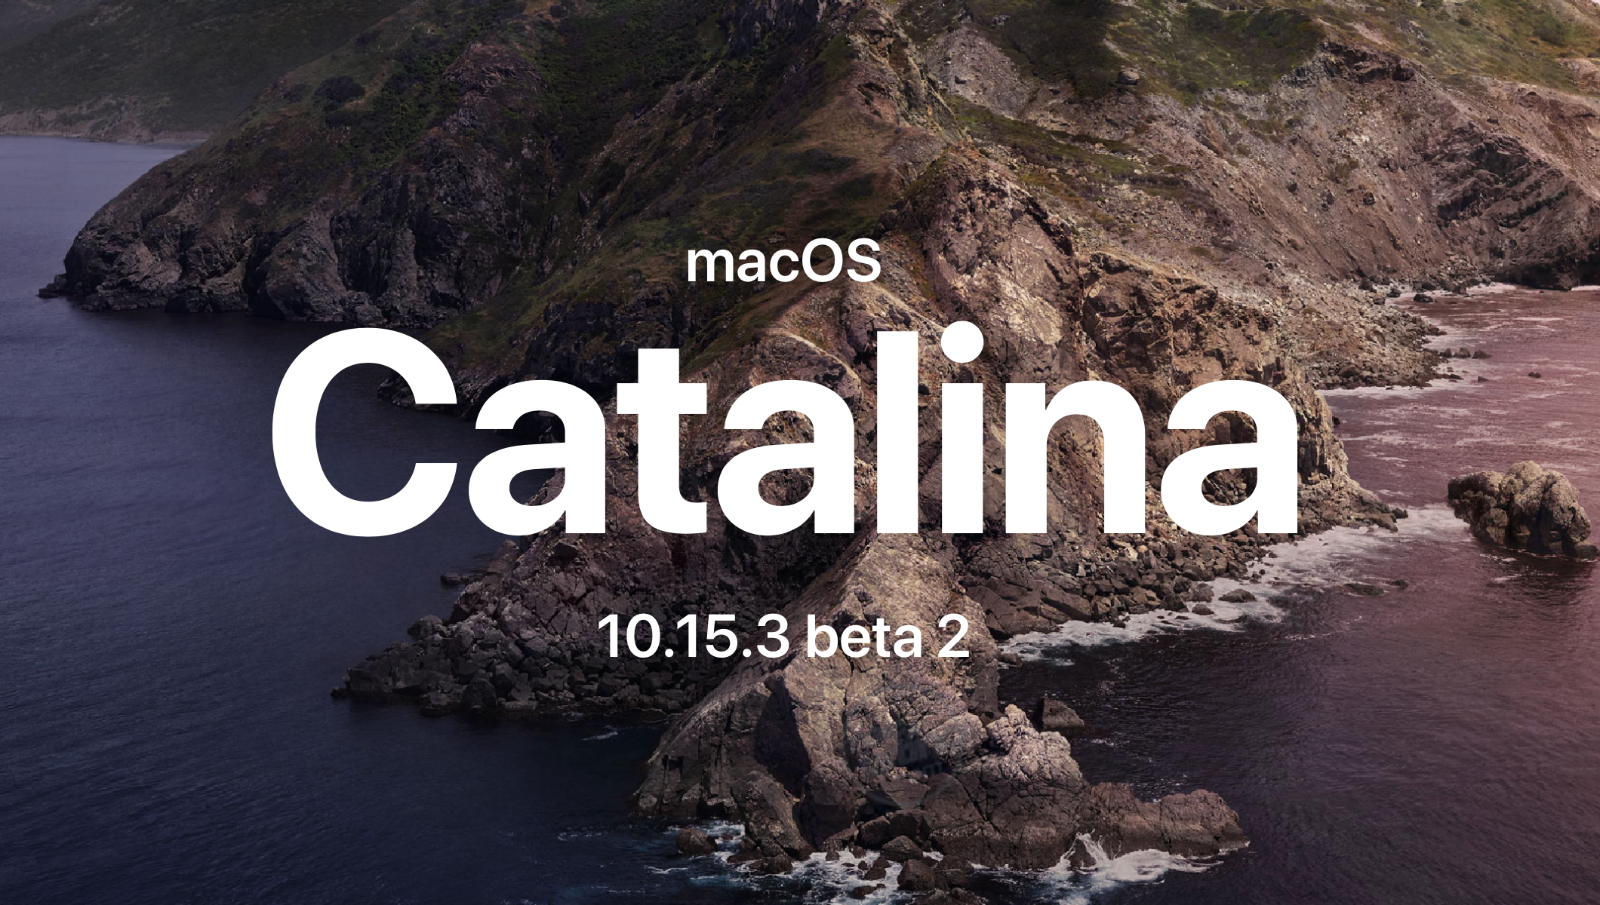 macOS Catalina 10.15.3 beta 2